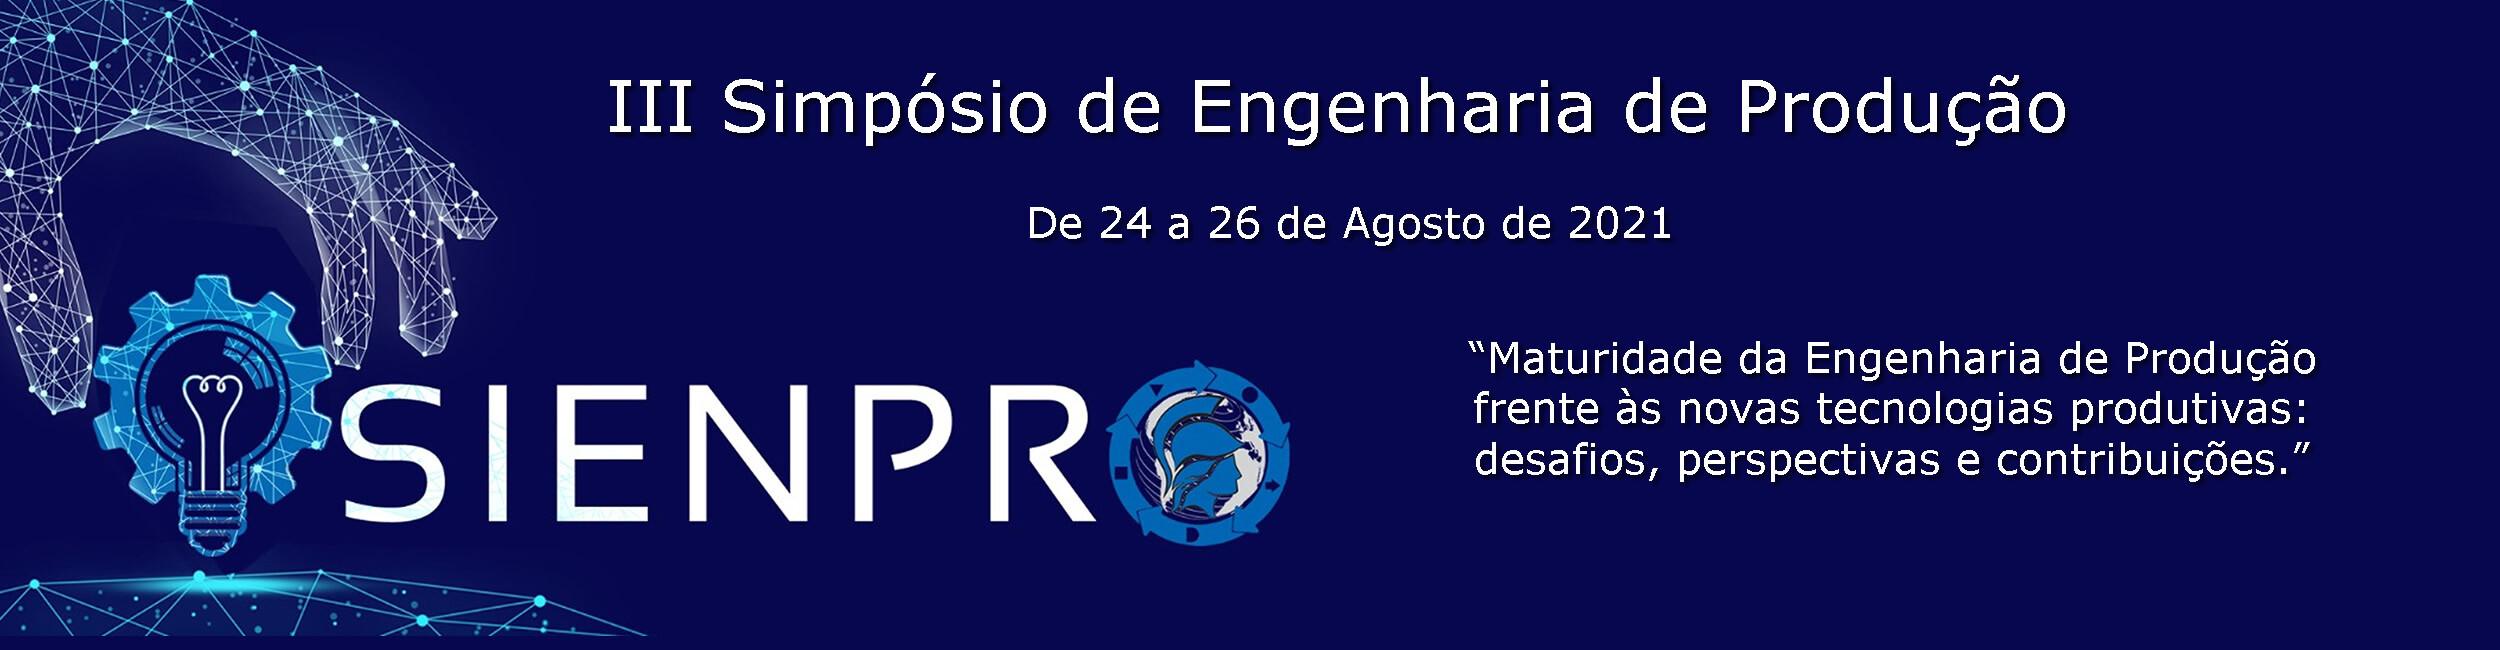 banner principal image